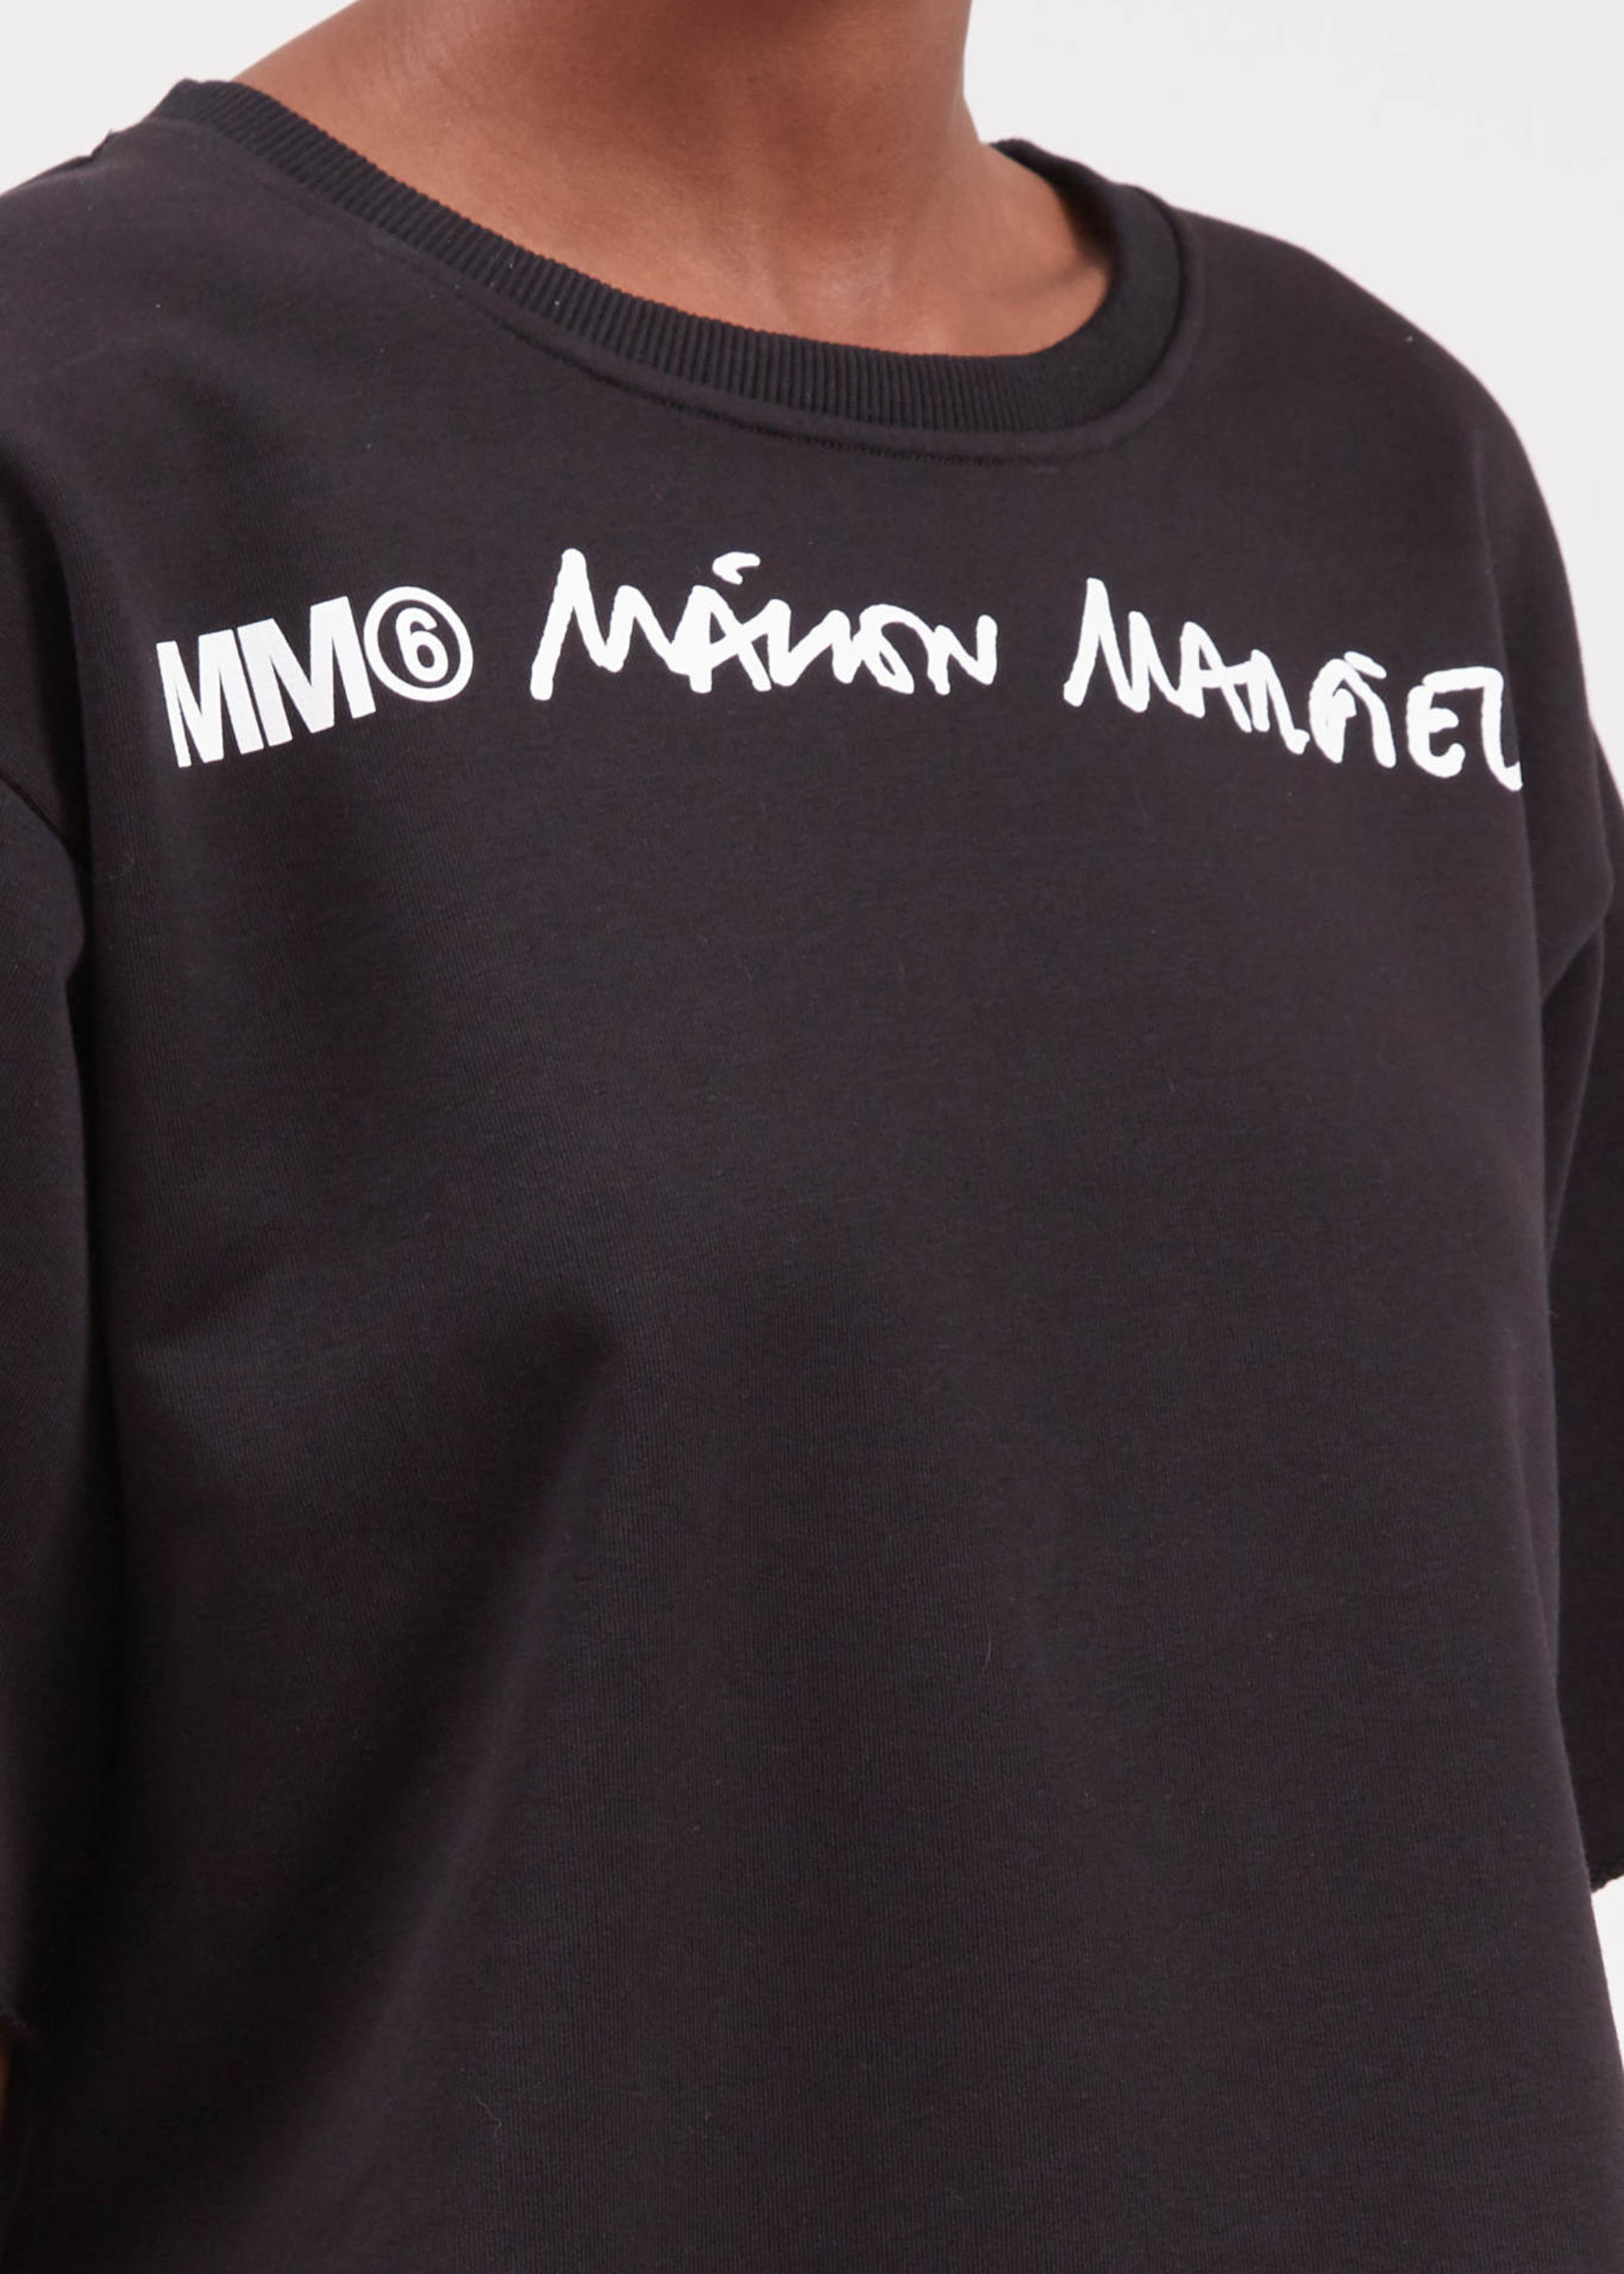 MM6 MAISON MARGIELA Cropped Logo Sweatshirt in Black